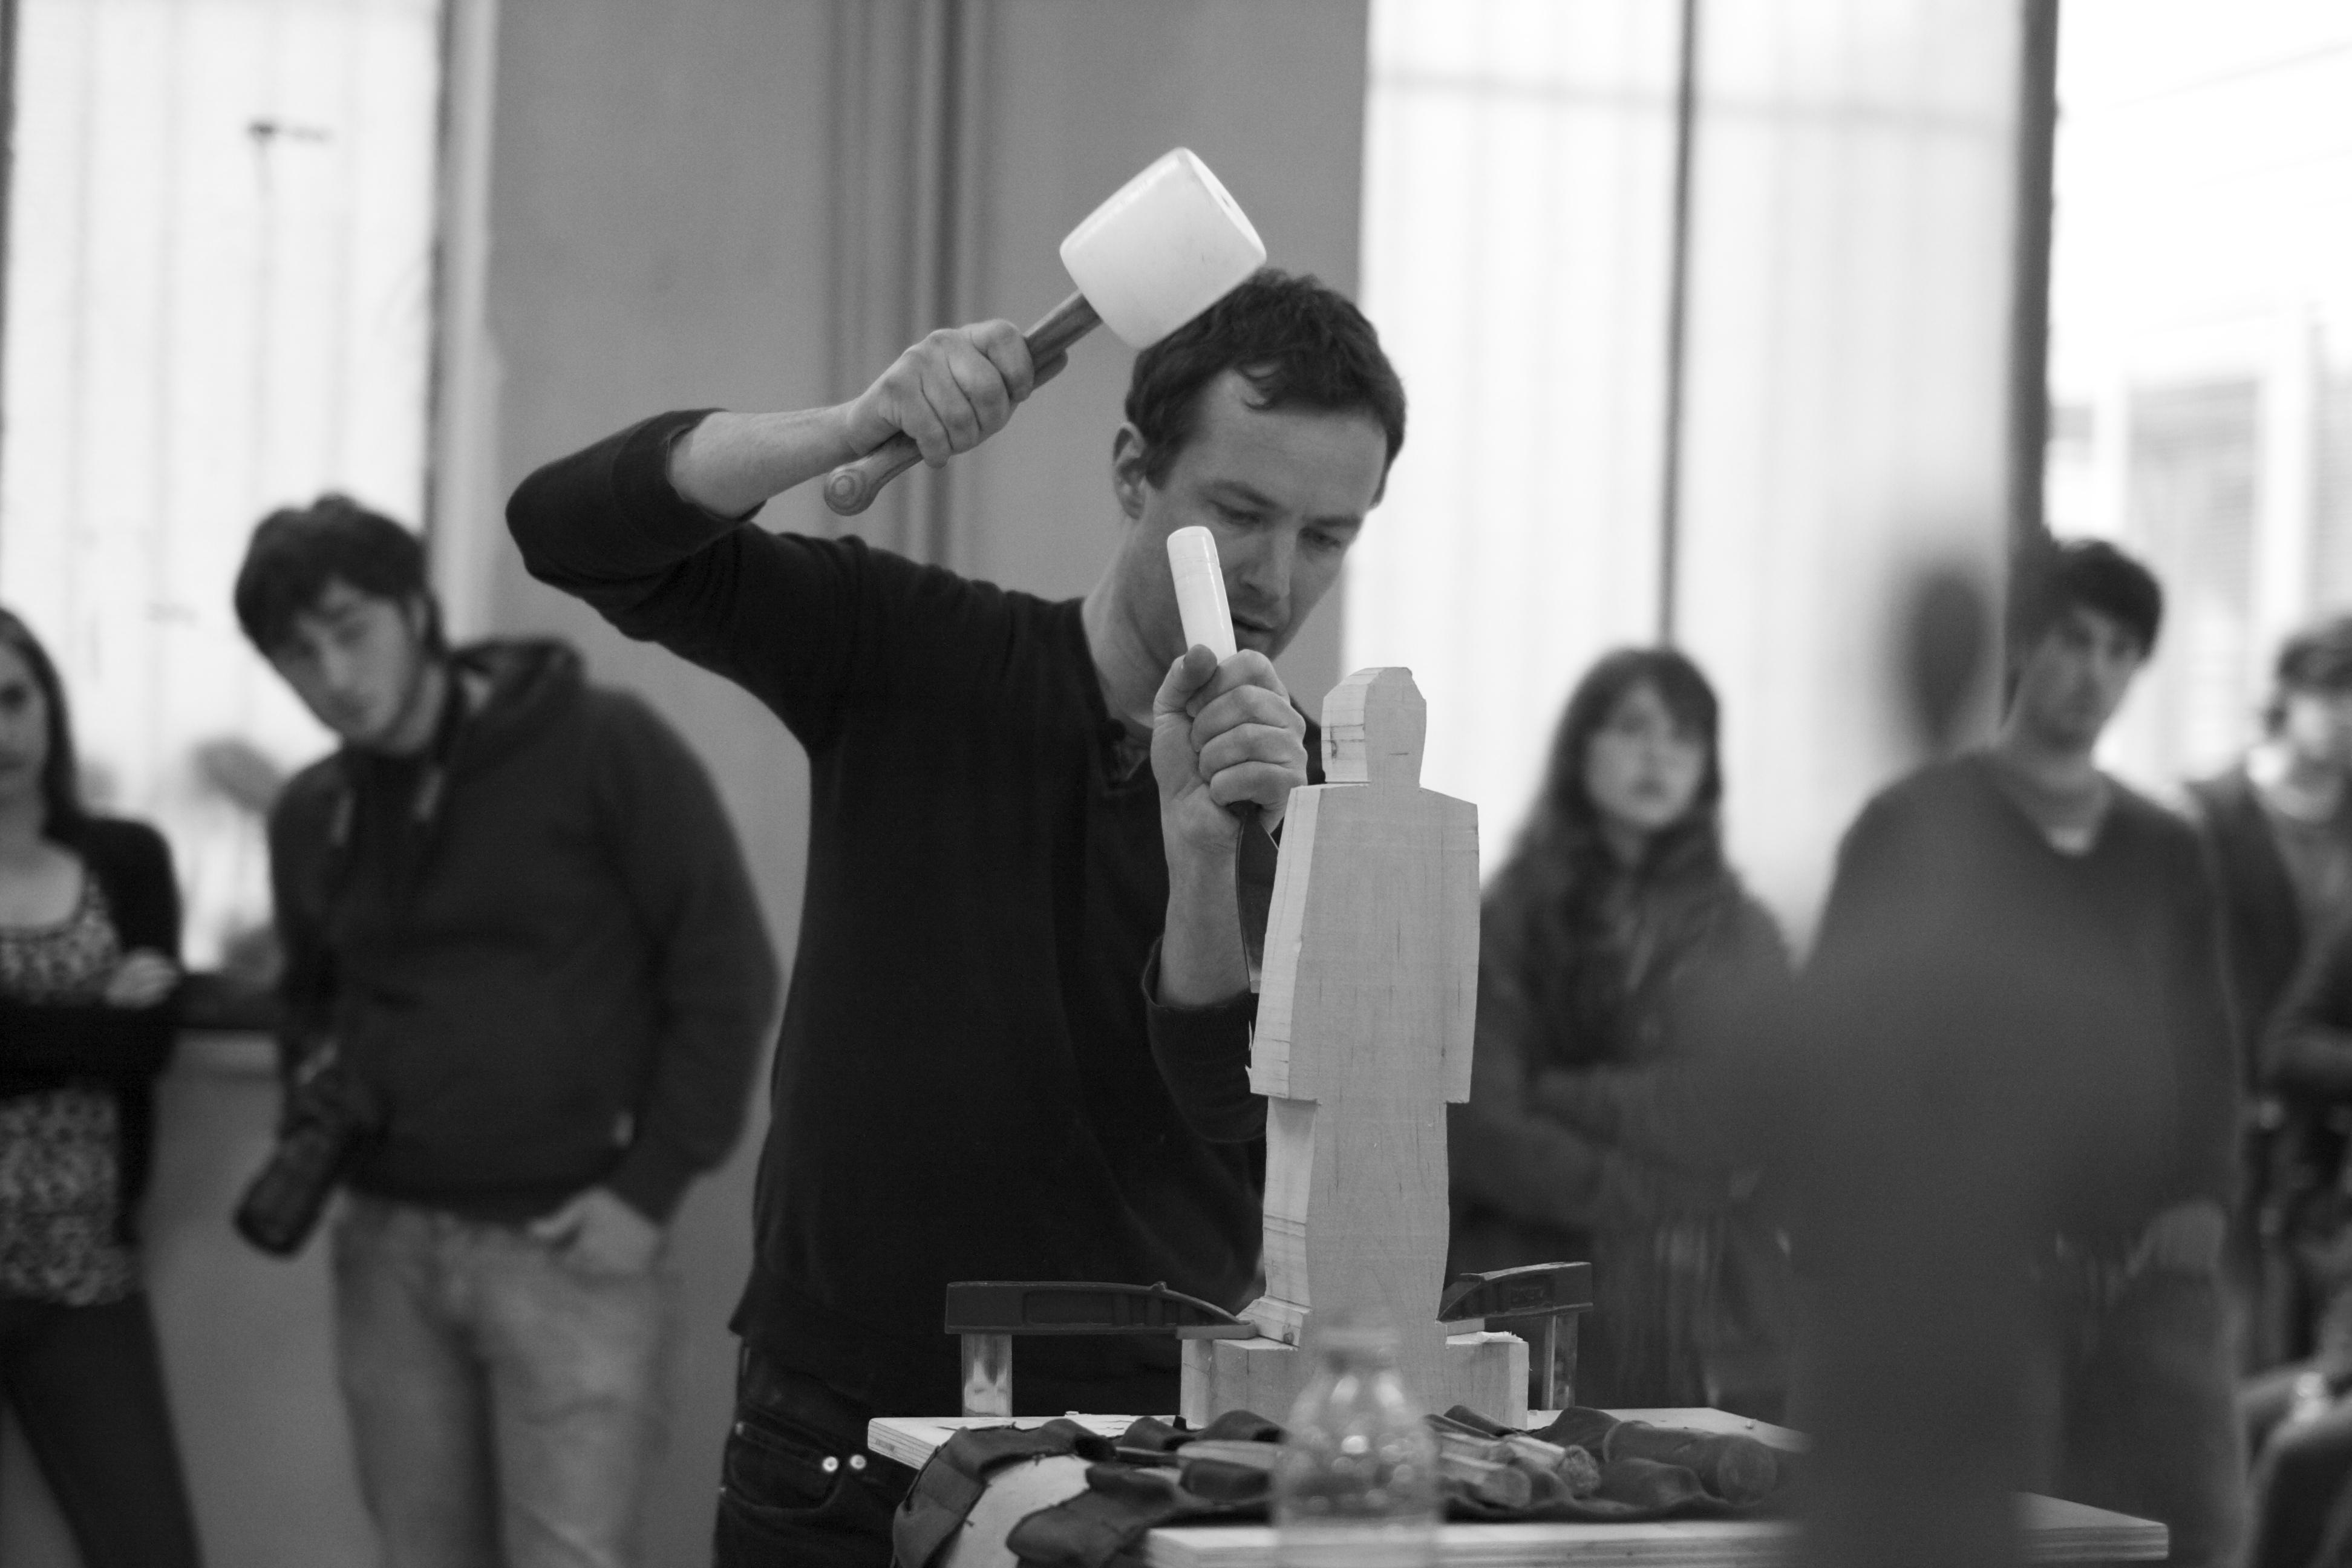 Flickr - Aron Demetz - Dialoghi e materia - Workshop a cura di Franco Reina59